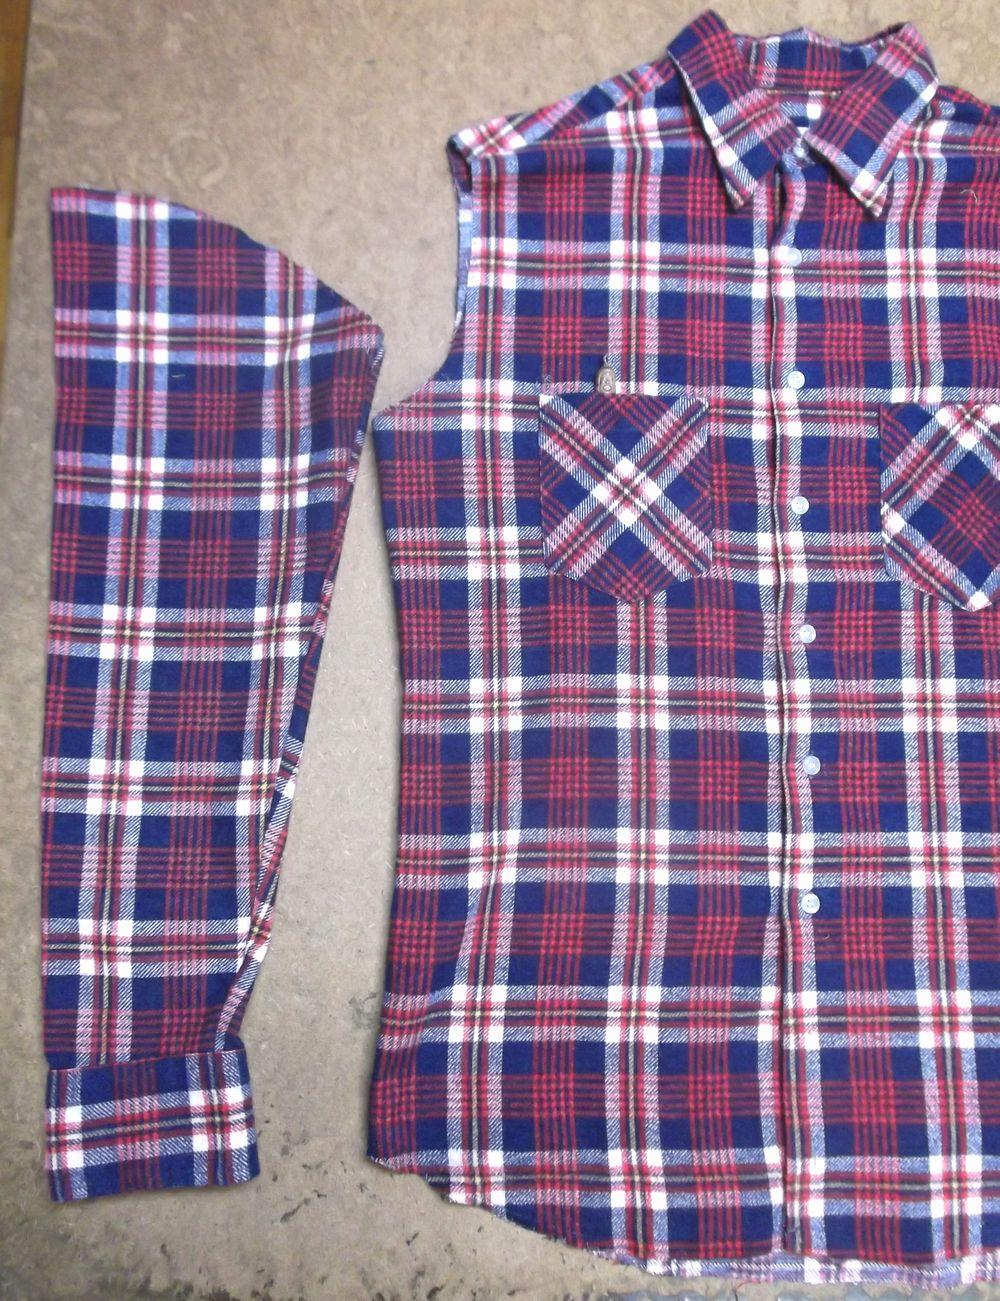 shirt298-3